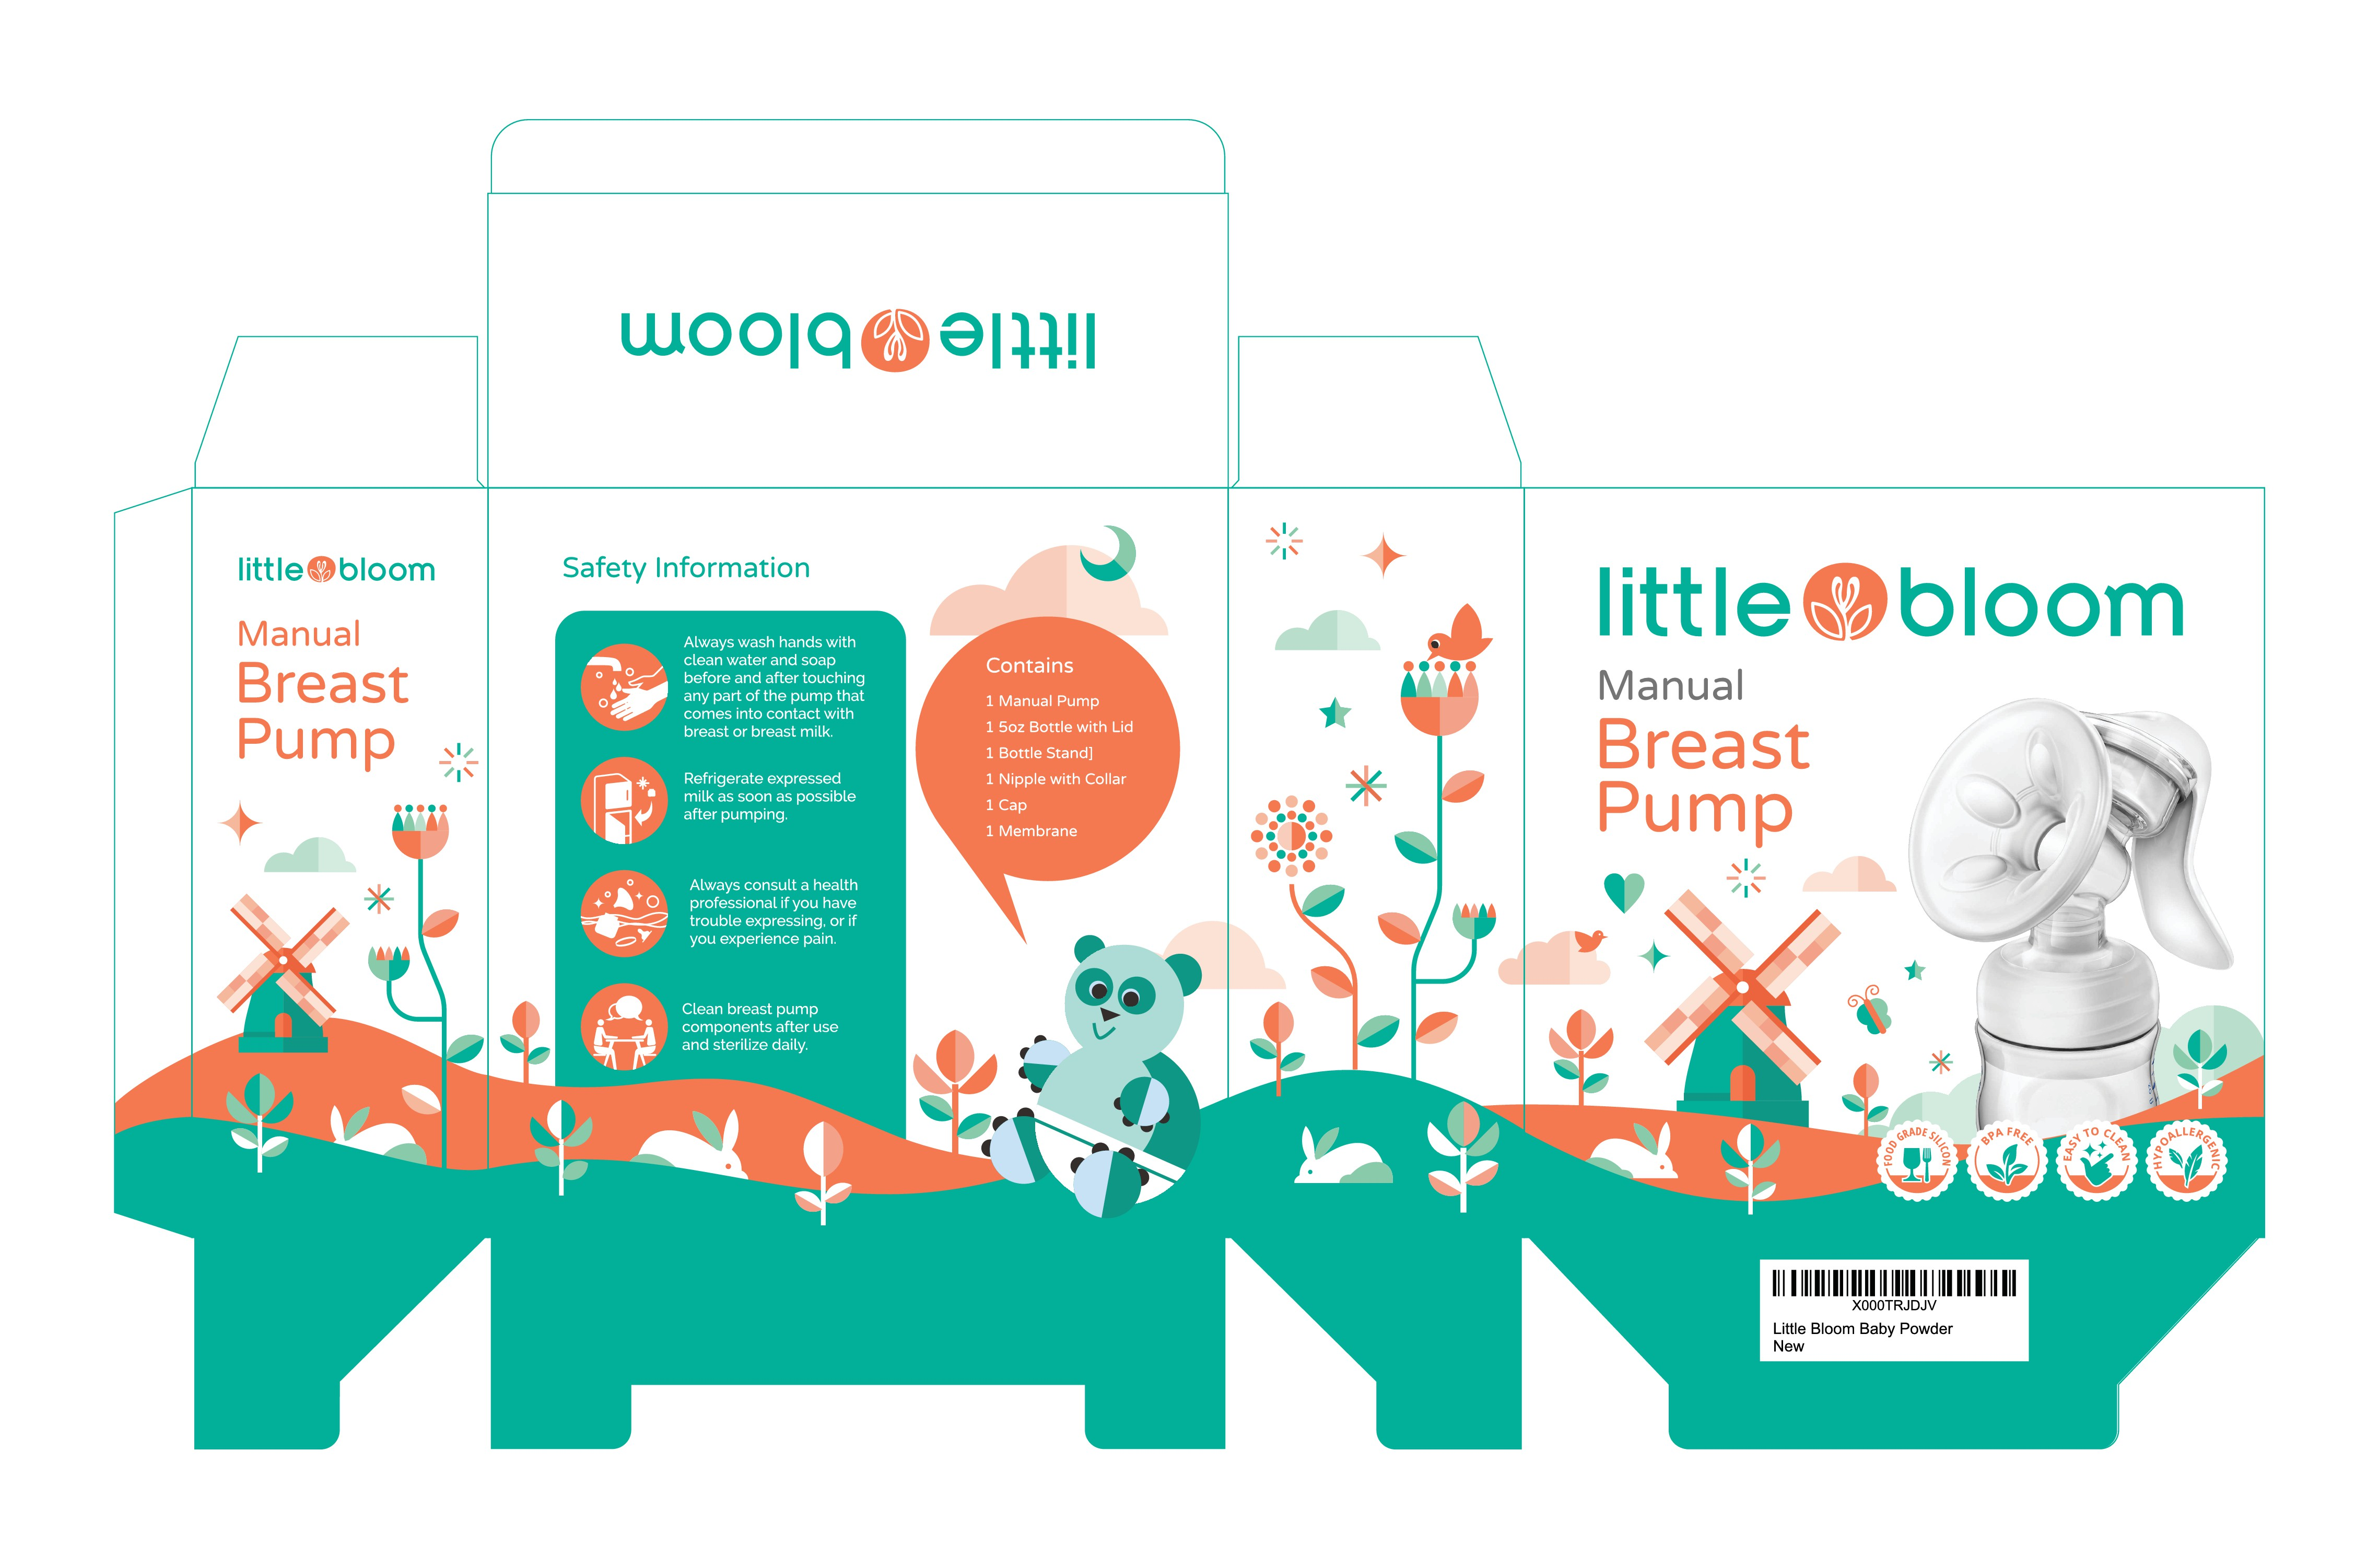 Packaging design for Little Bloom Breast Pump. Additional work opportunity for winning designer.